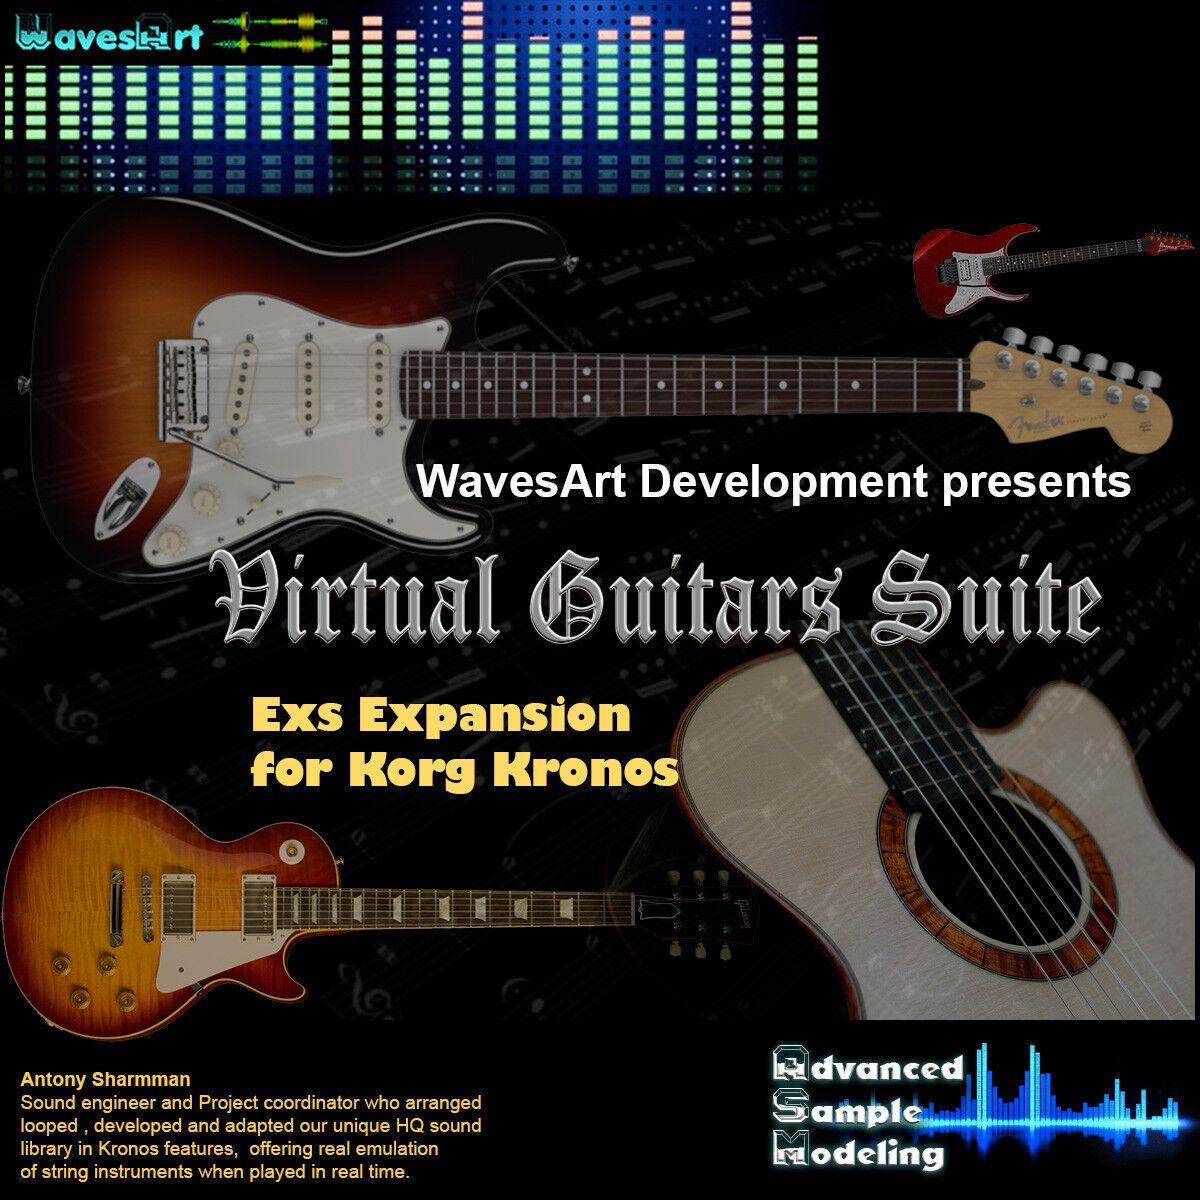 Korg Kronos EXs Sound Library Guitars Suite